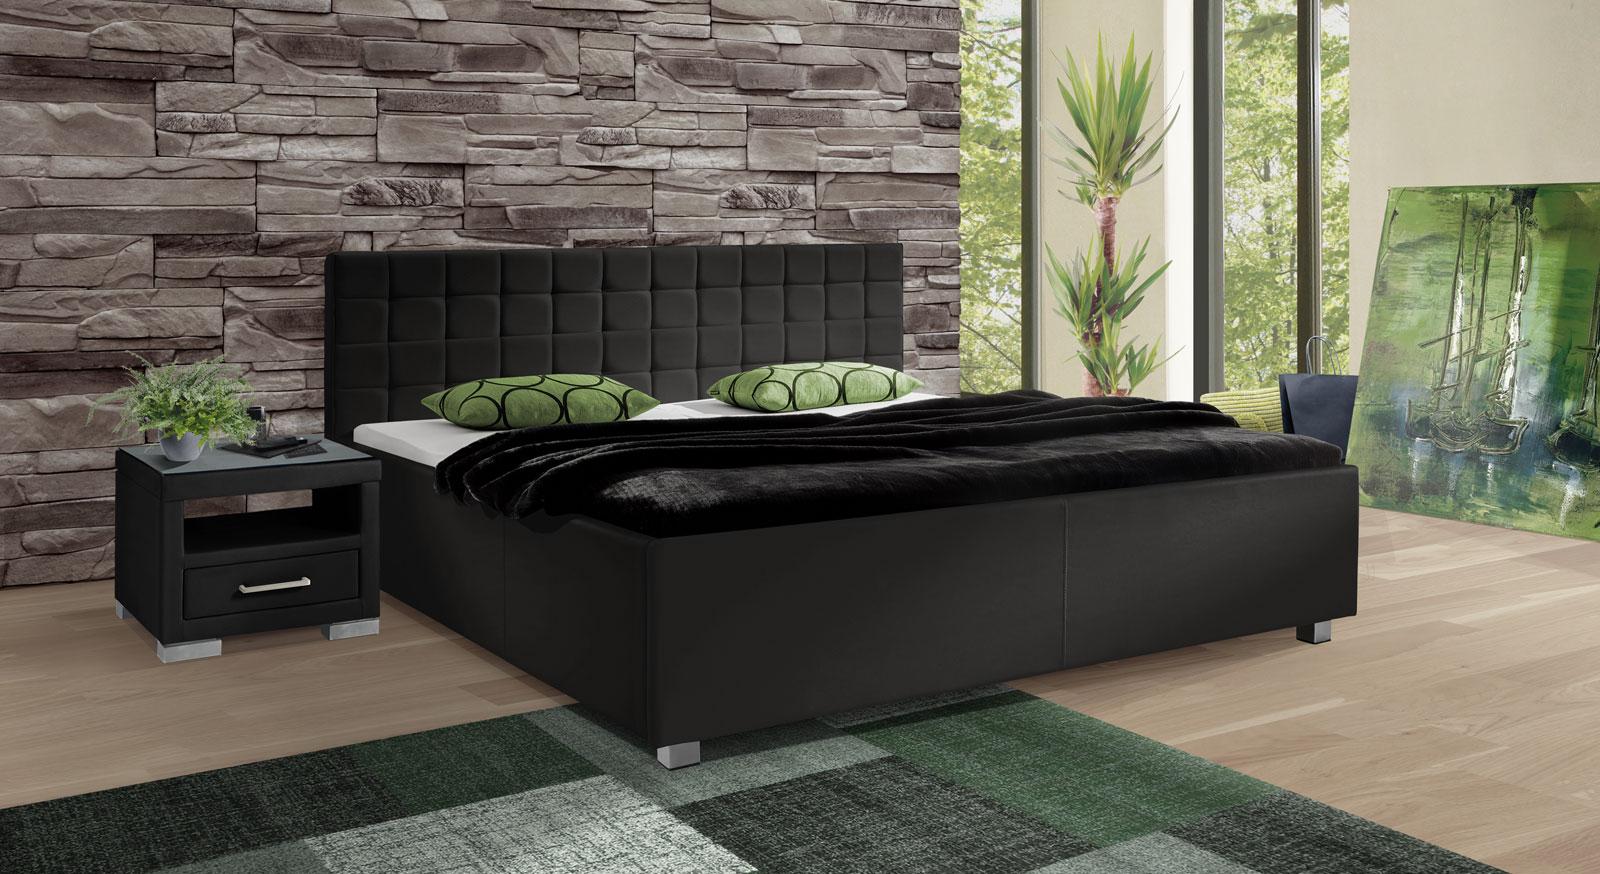 bett in 180x200 cm in wei aus kunstleder withernsea. Black Bedroom Furniture Sets. Home Design Ideas